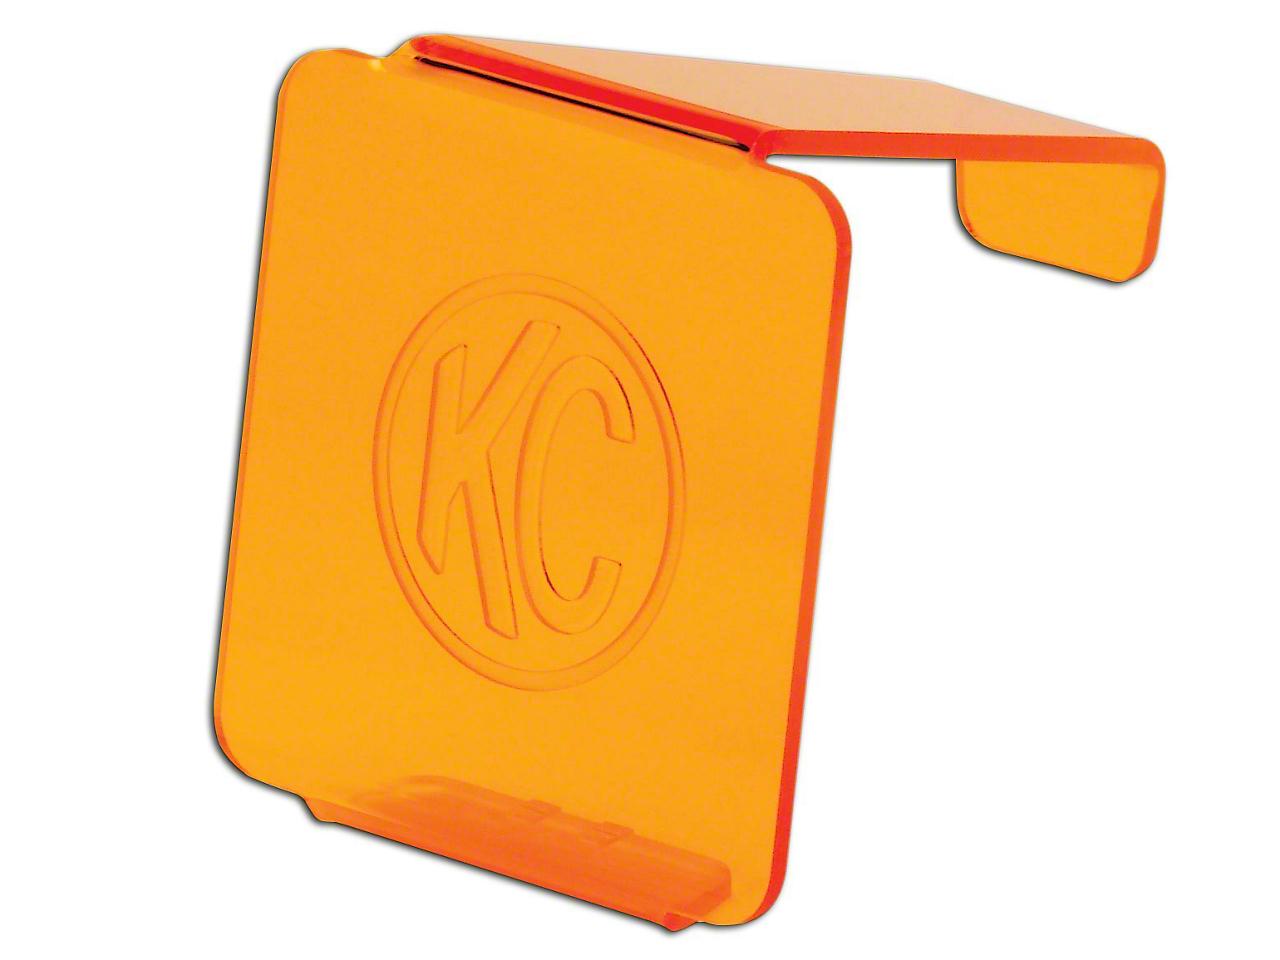 KC HiLiTES Hard Cover for 3 in. LZR Cube Light - Orange (07-18 Silverado 1500)